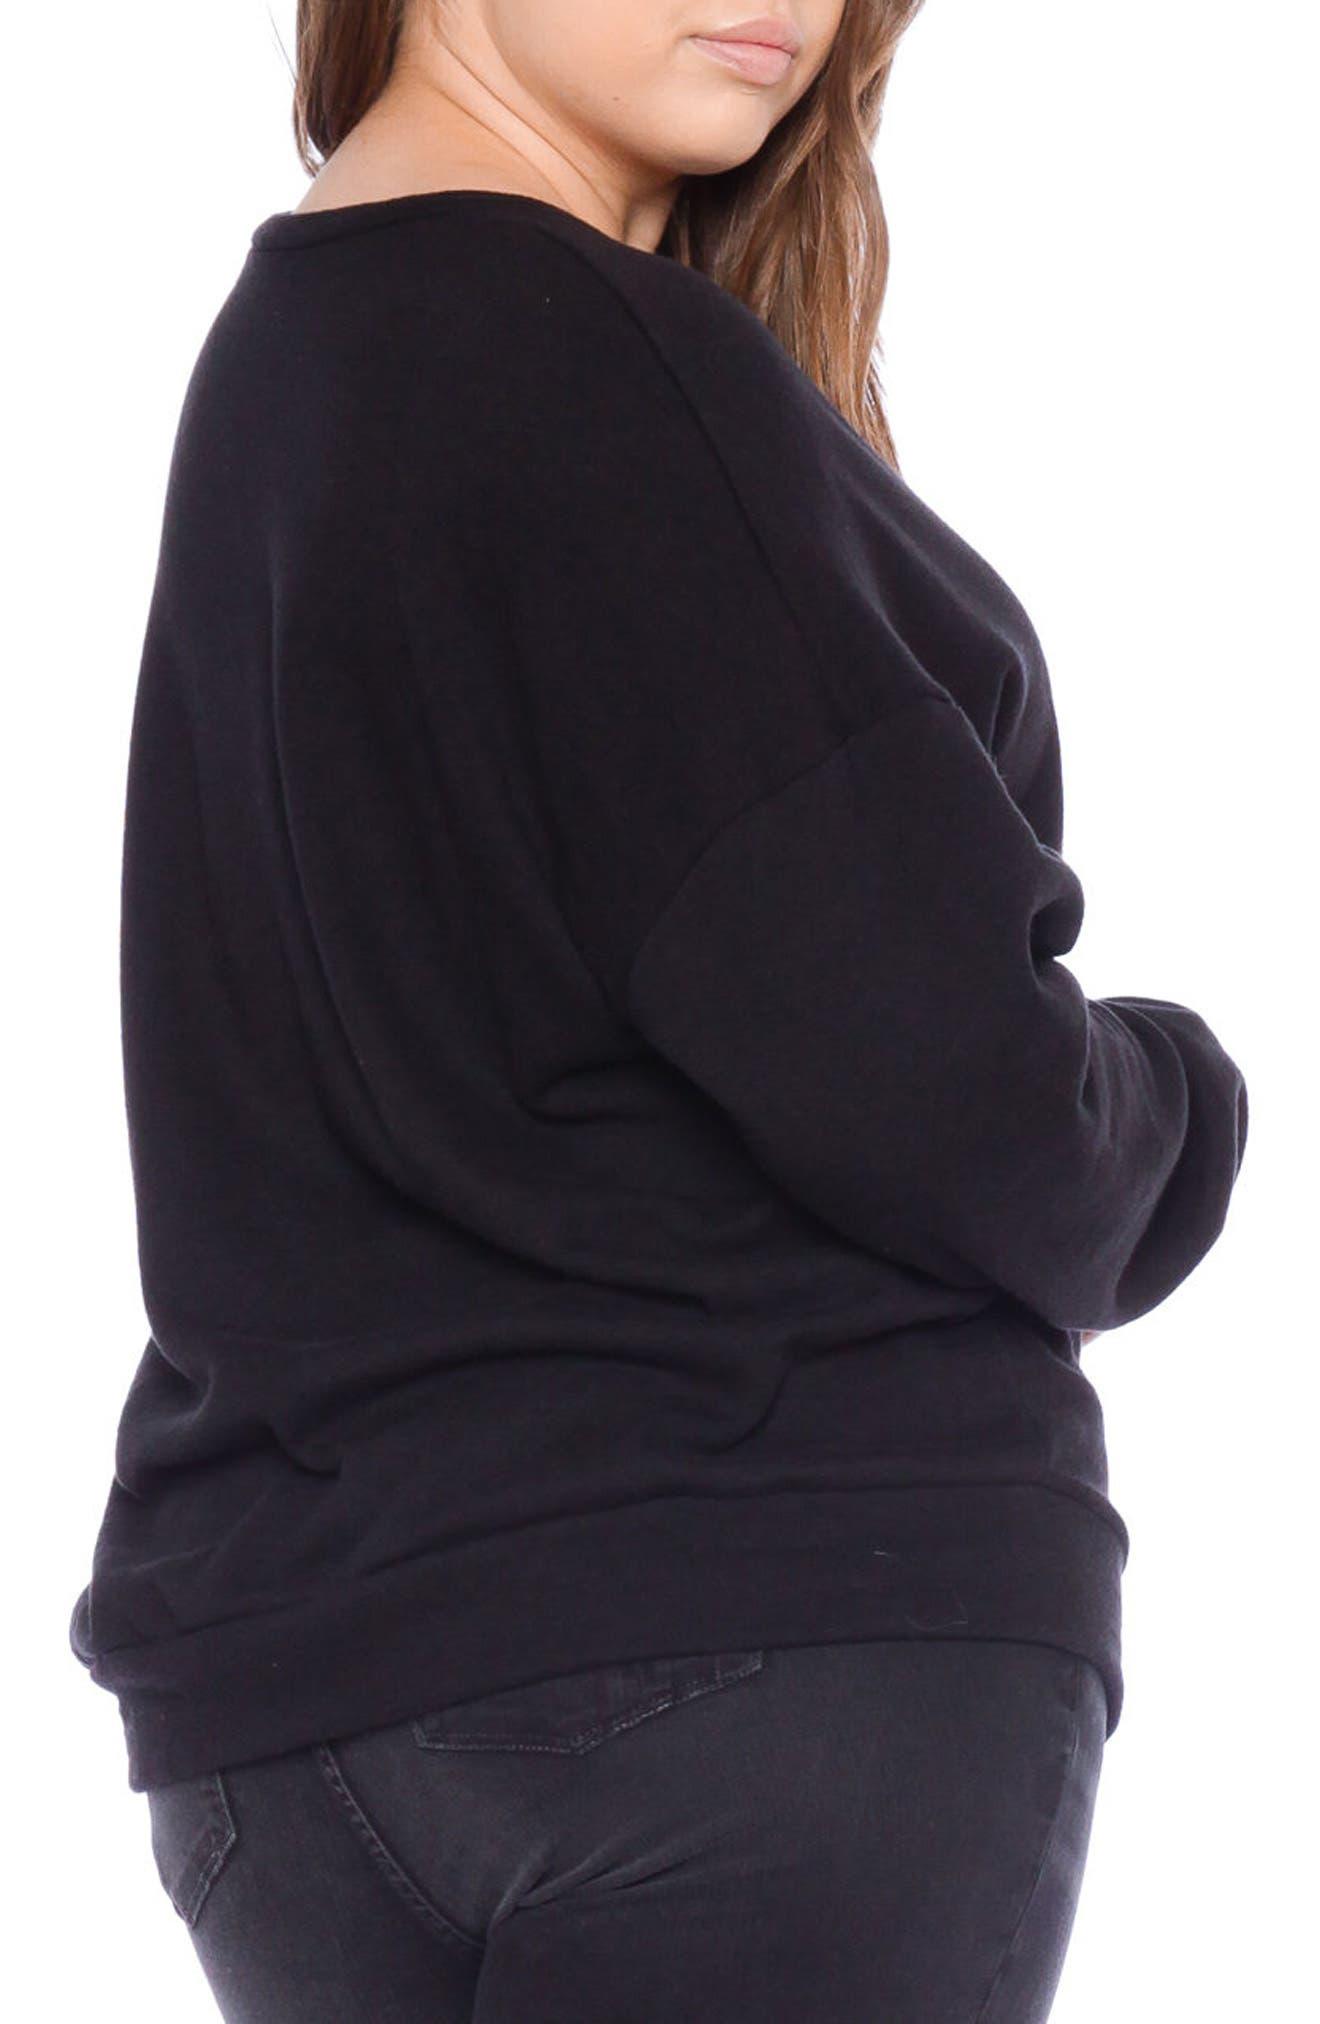 SLINK JEANS,                             I Am the One Oversize Sweatshirt,                             Alternate thumbnail 2, color,                             BLACK